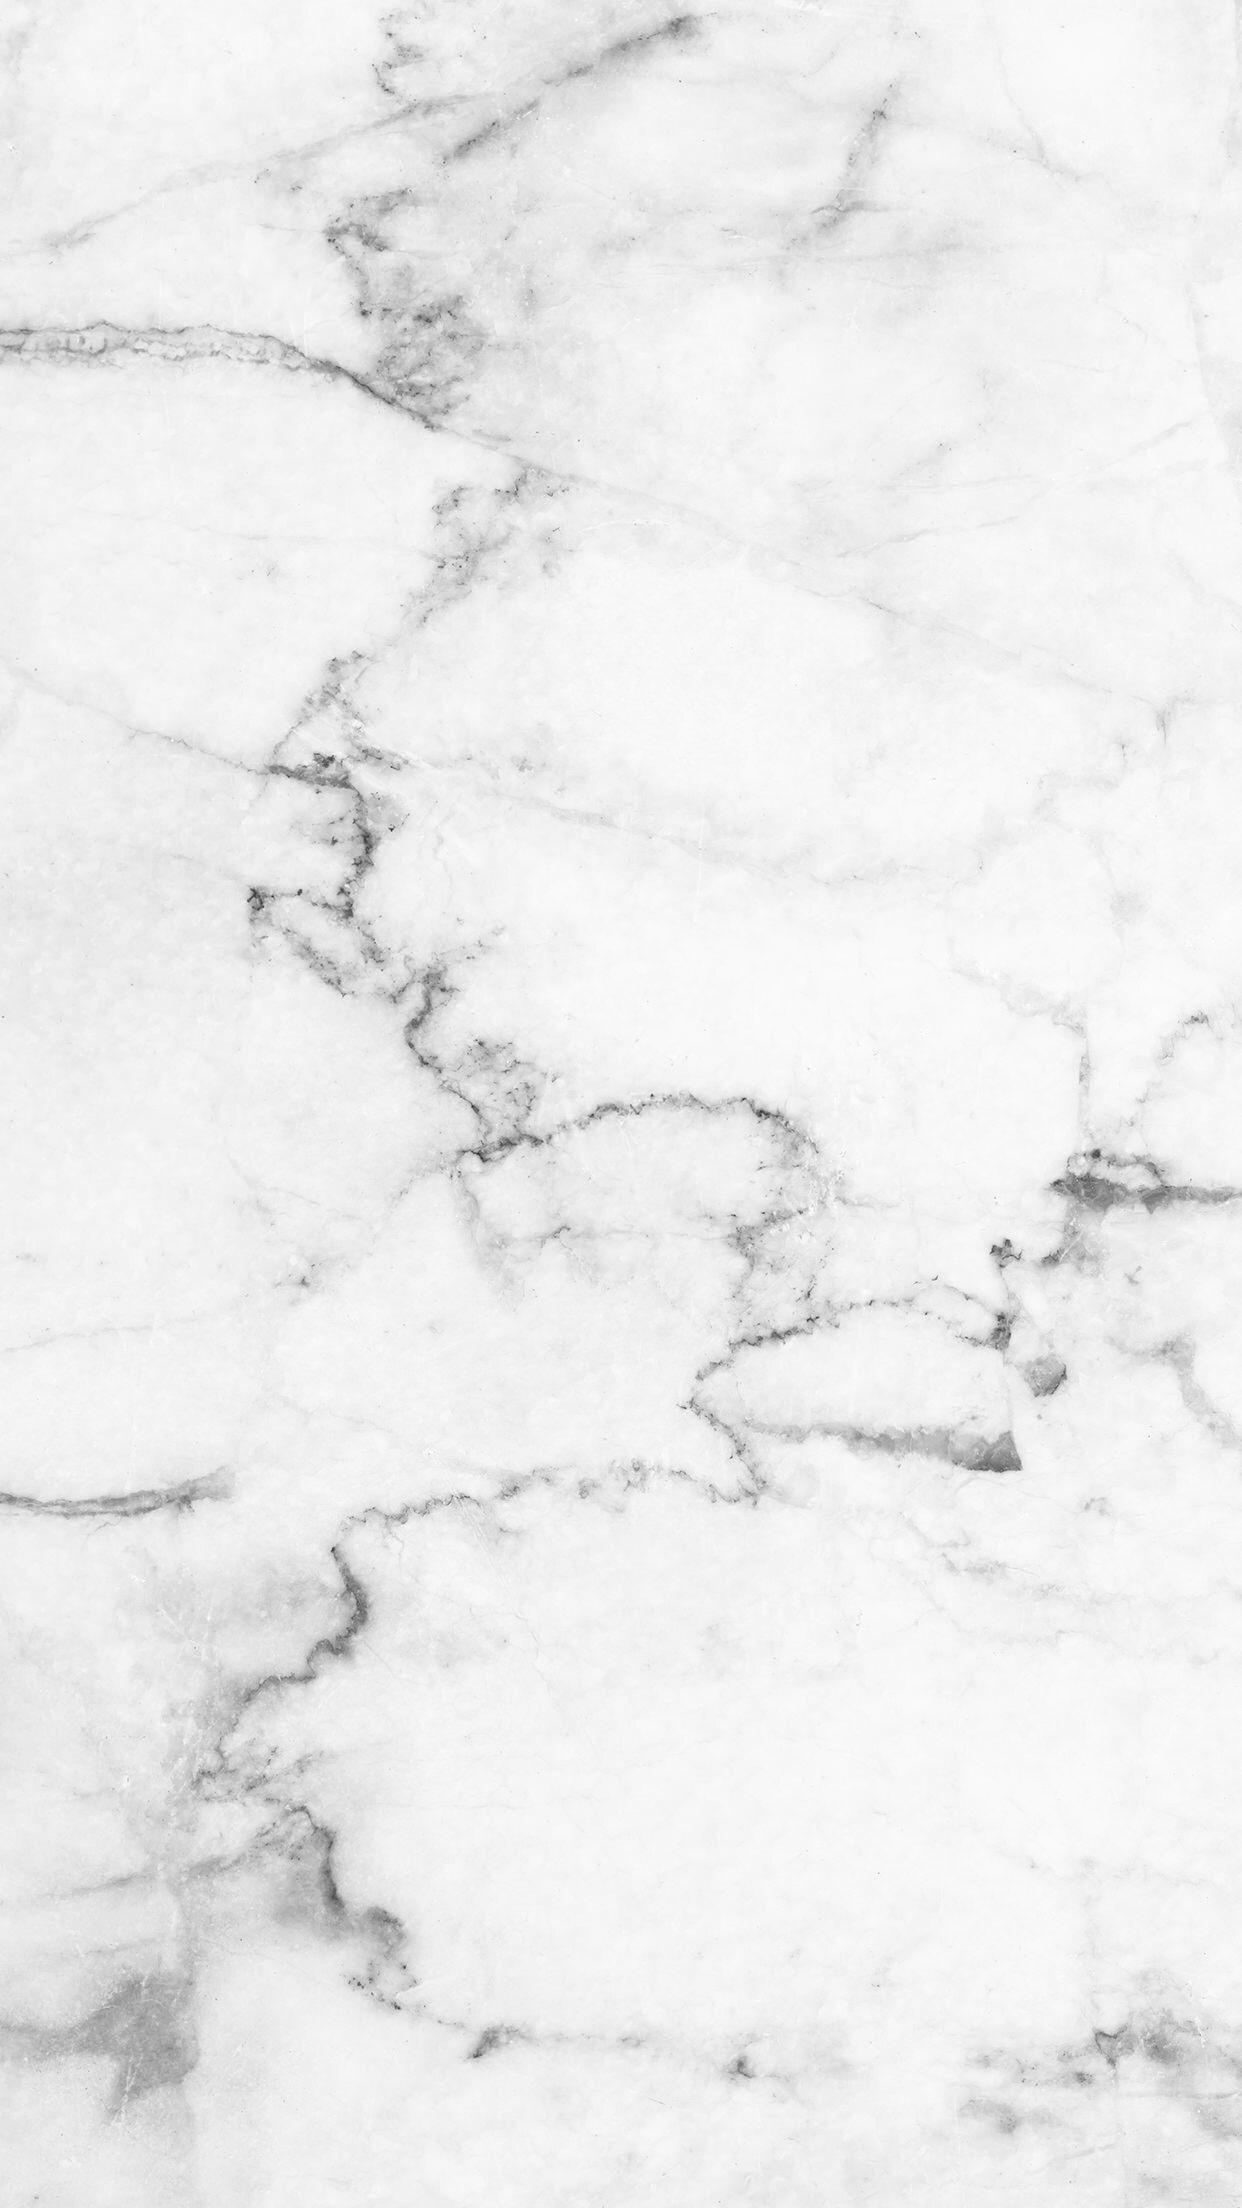 Fondo Iphone De Marmol Marble Iphone Wallpaper Marble Background Iphone Marble Wallpaper Phone